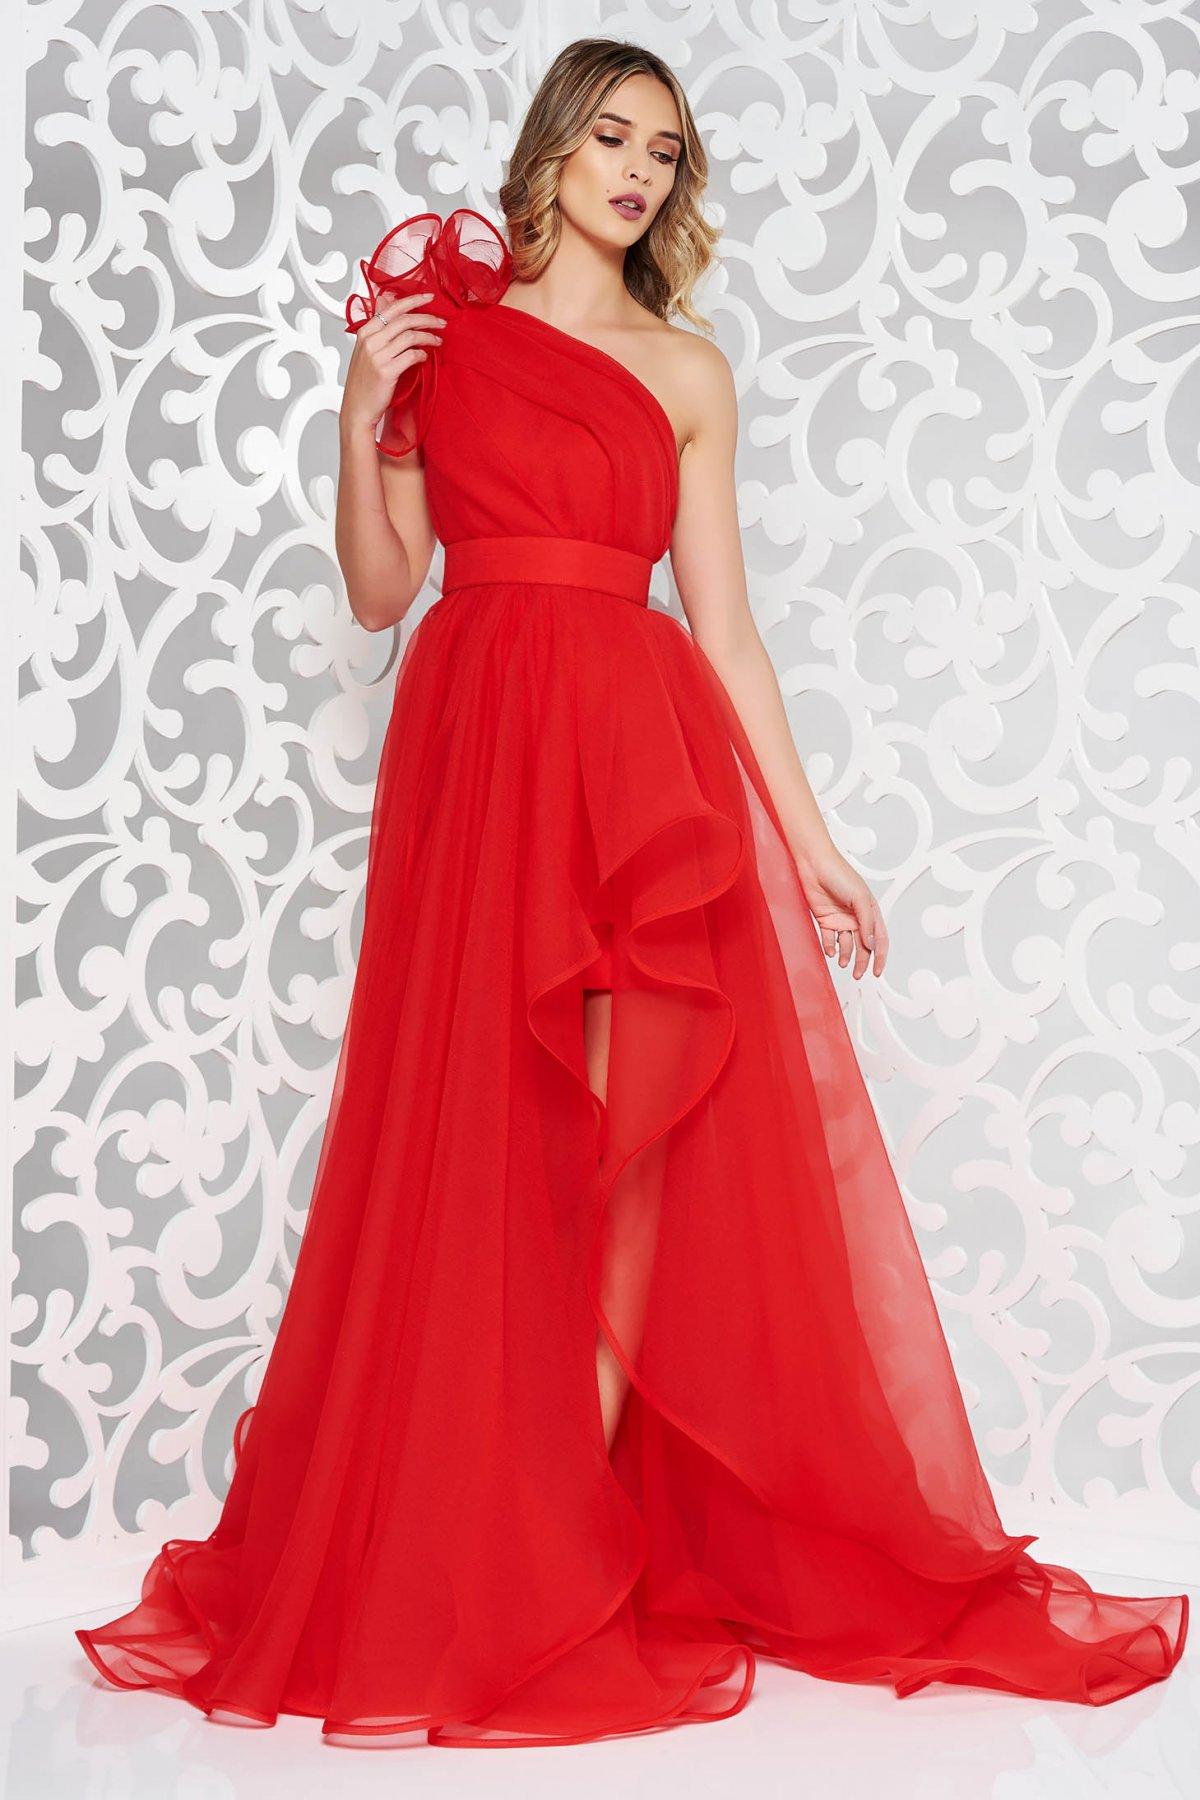 Rochie Ana Radu rosie de lux asimetrica pe umar captusita pe interior accesorizata cu cordon